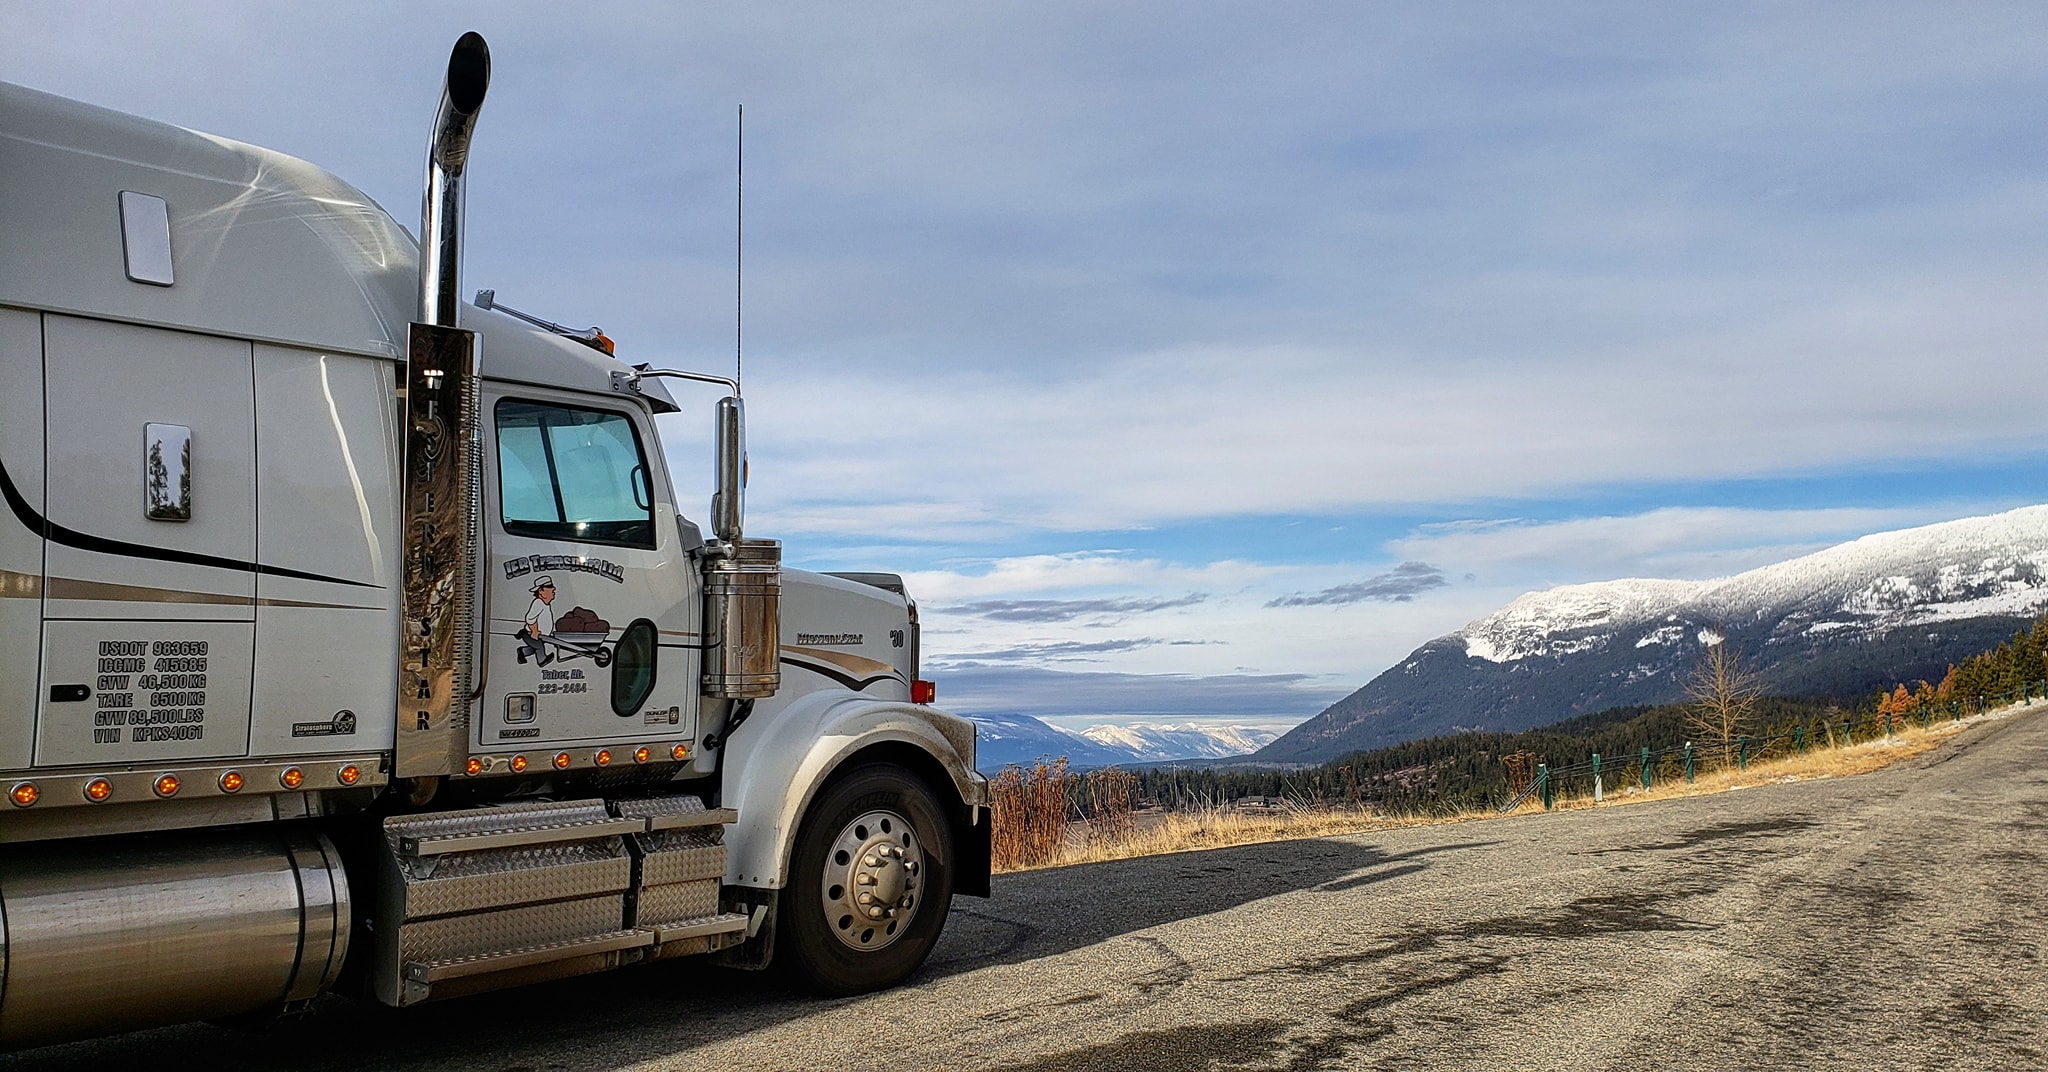 6-1-2019-rondreis-van-2800-km-Montana-Idaho-Oregon-Washington-(2)